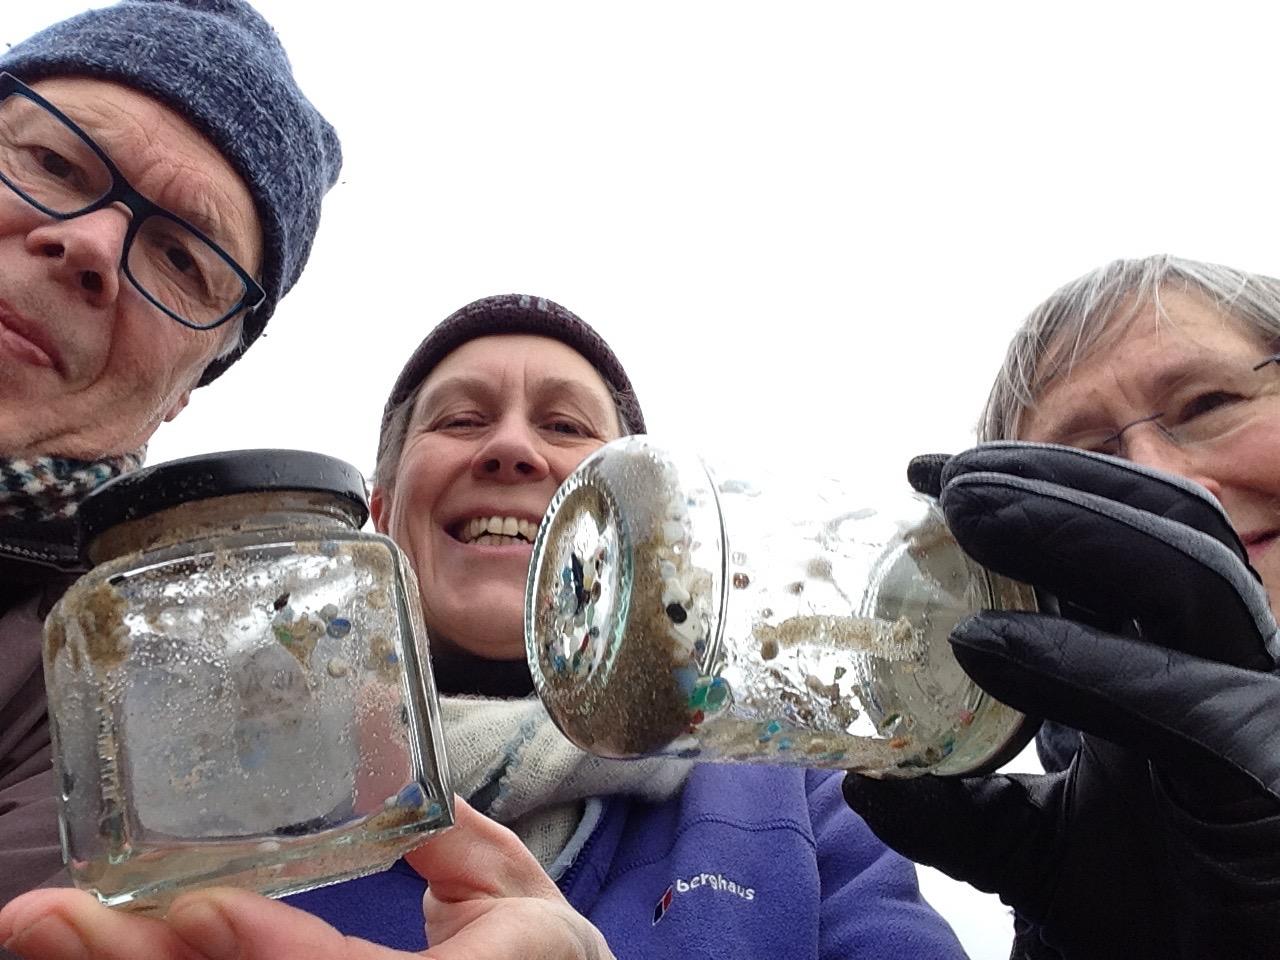 Nurdle hunt, highlighting plastics pollution